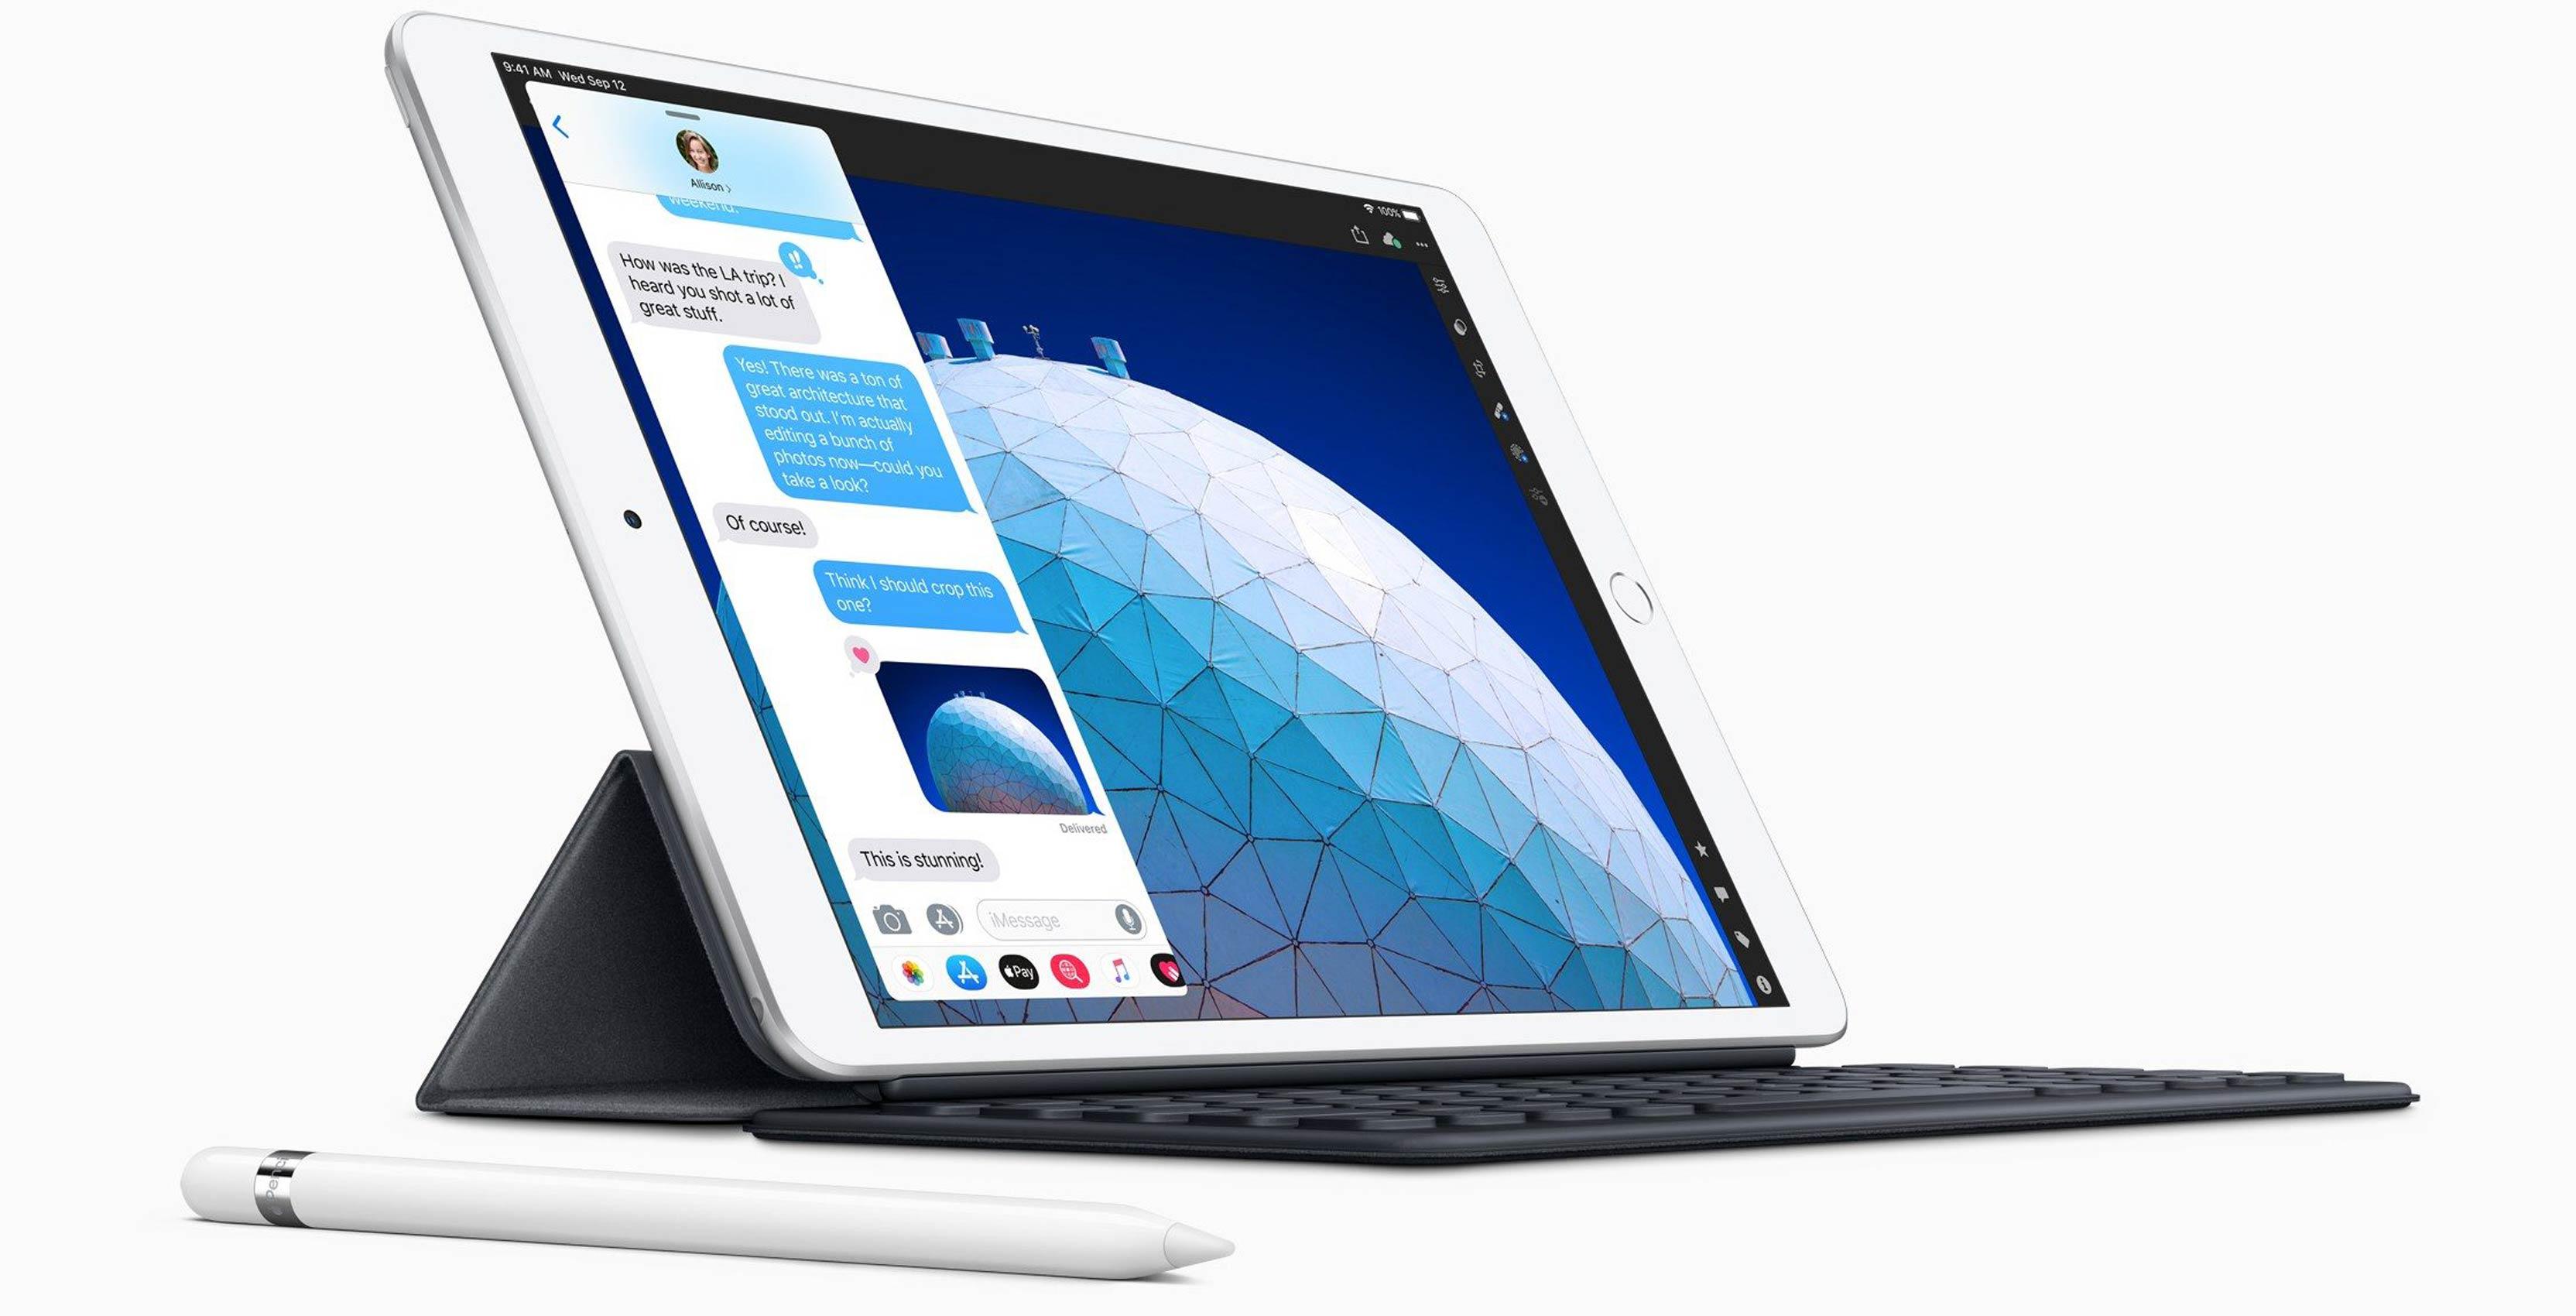 Apple's new 10.5-inch iPad Air